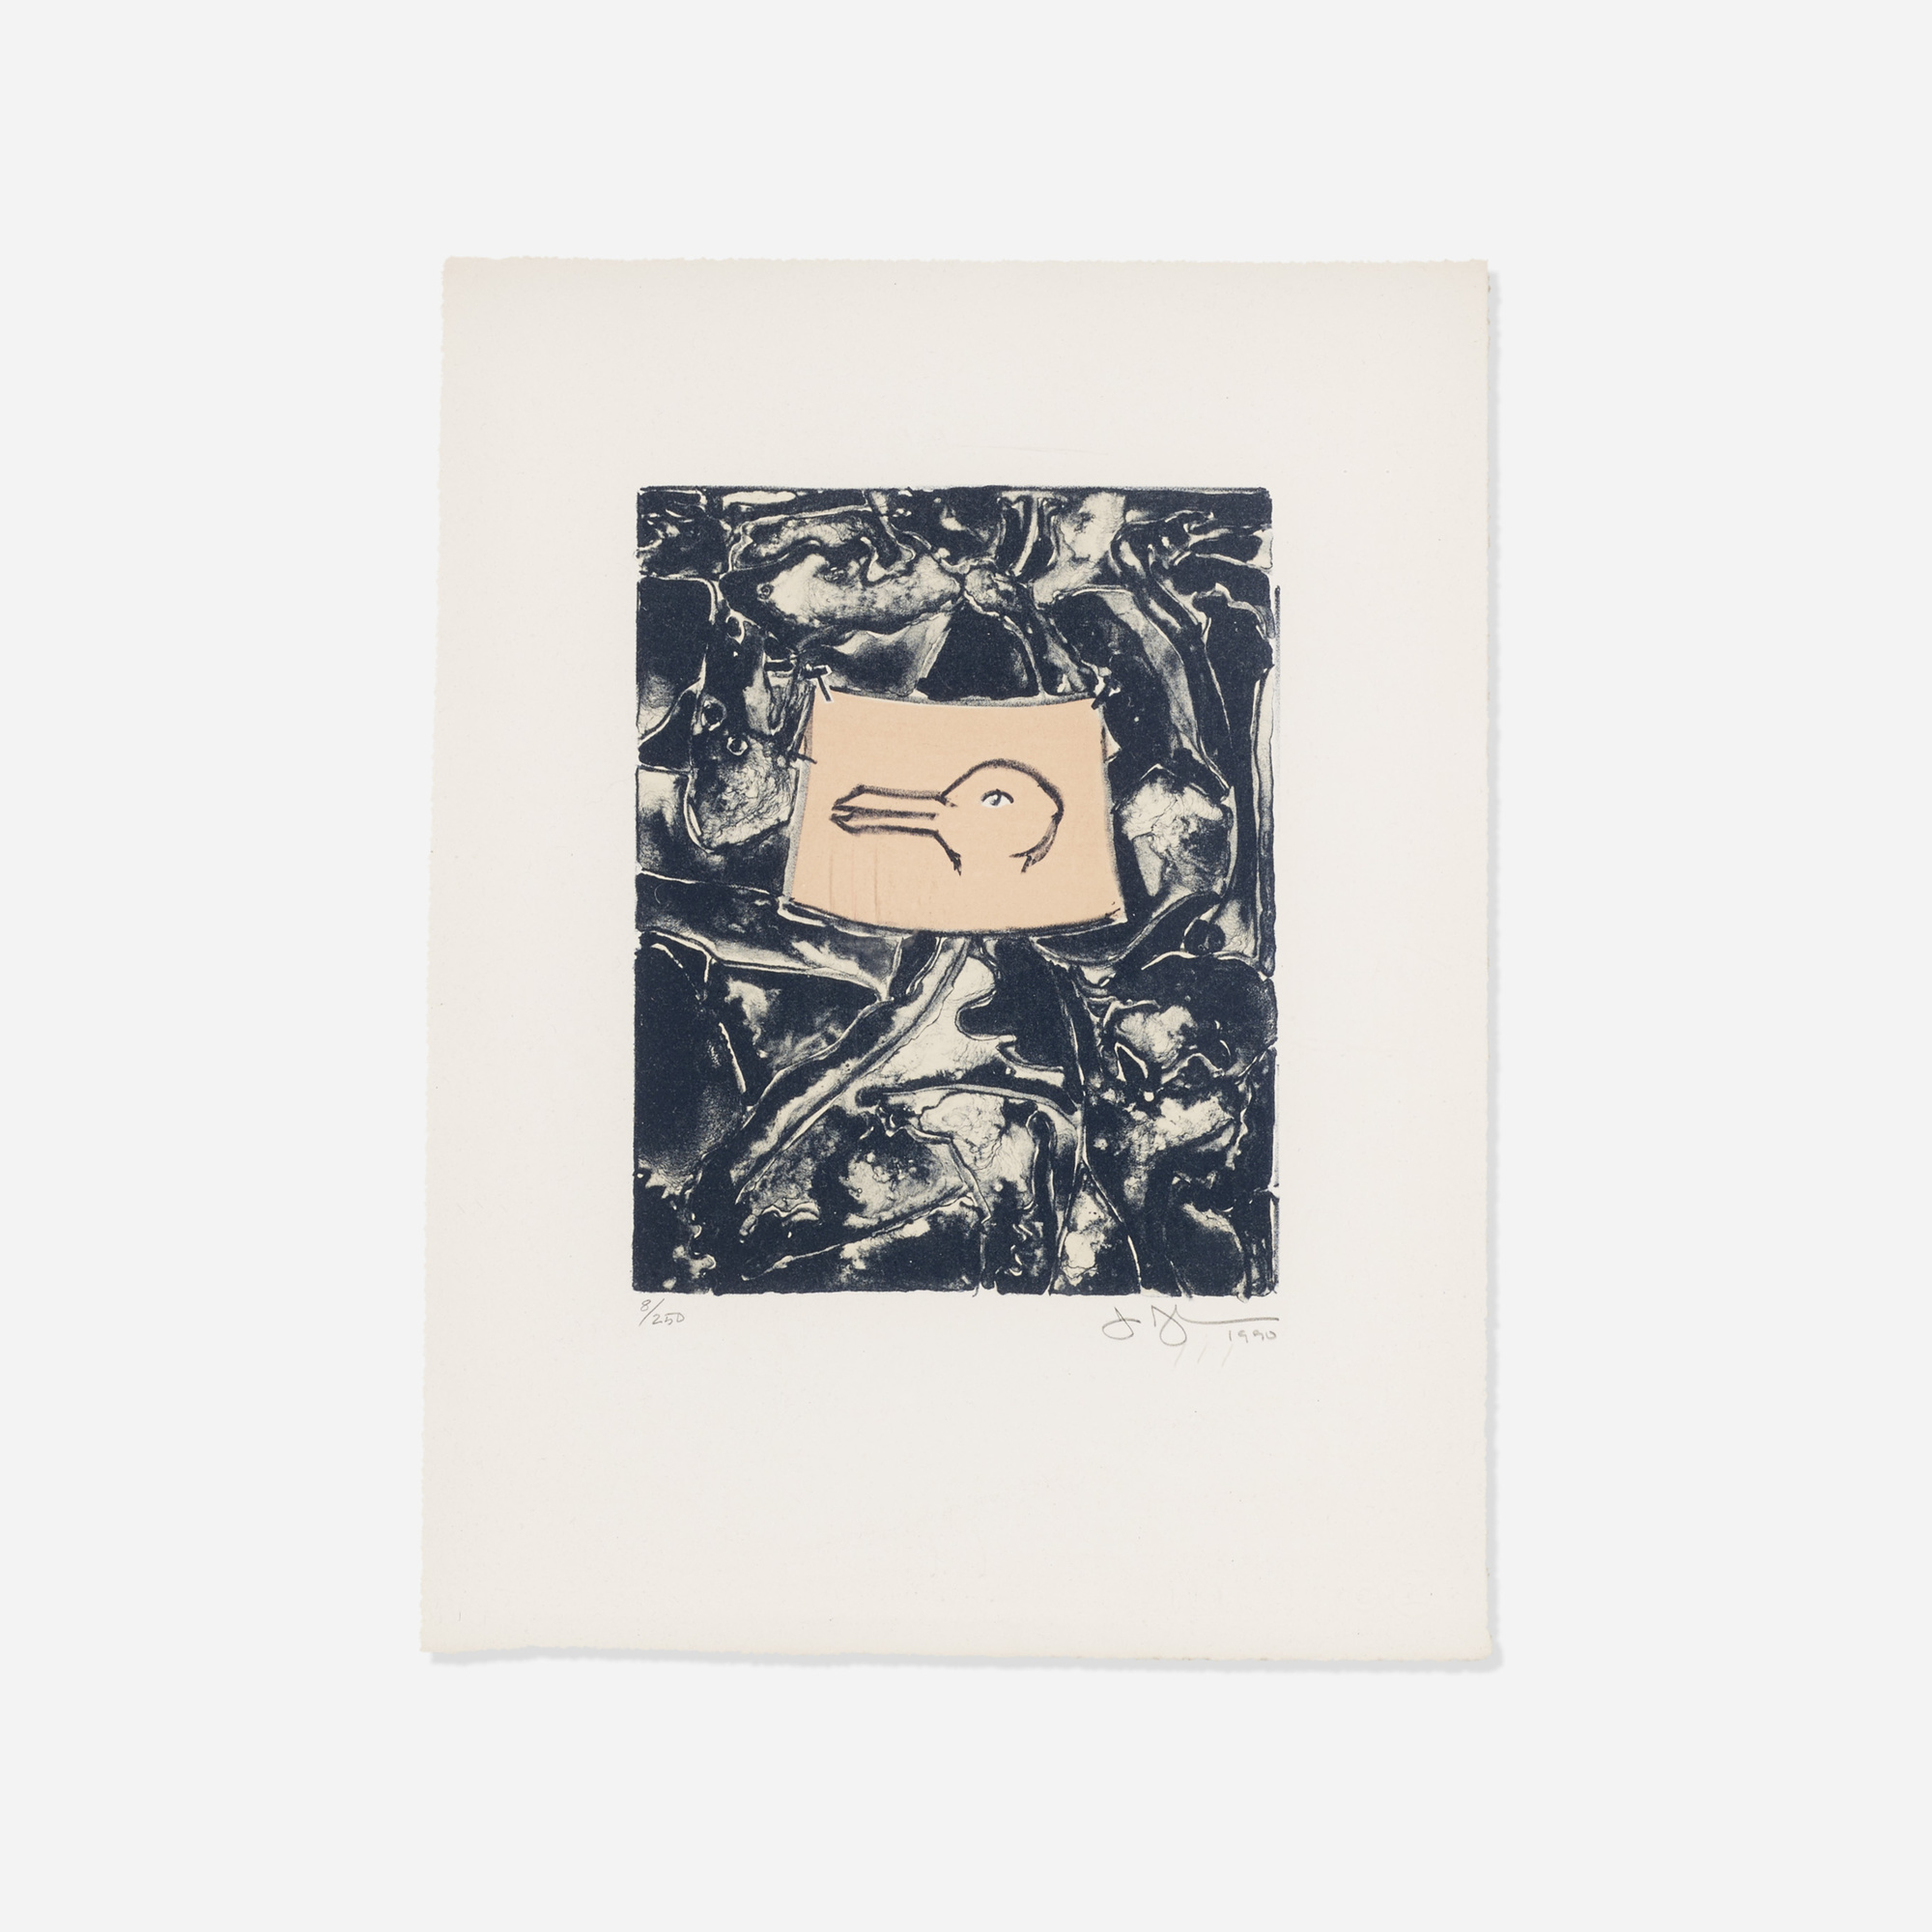 156: Jasper Johns / Untitled (from the Harvey Gantt Portfolio) (1 of 1)